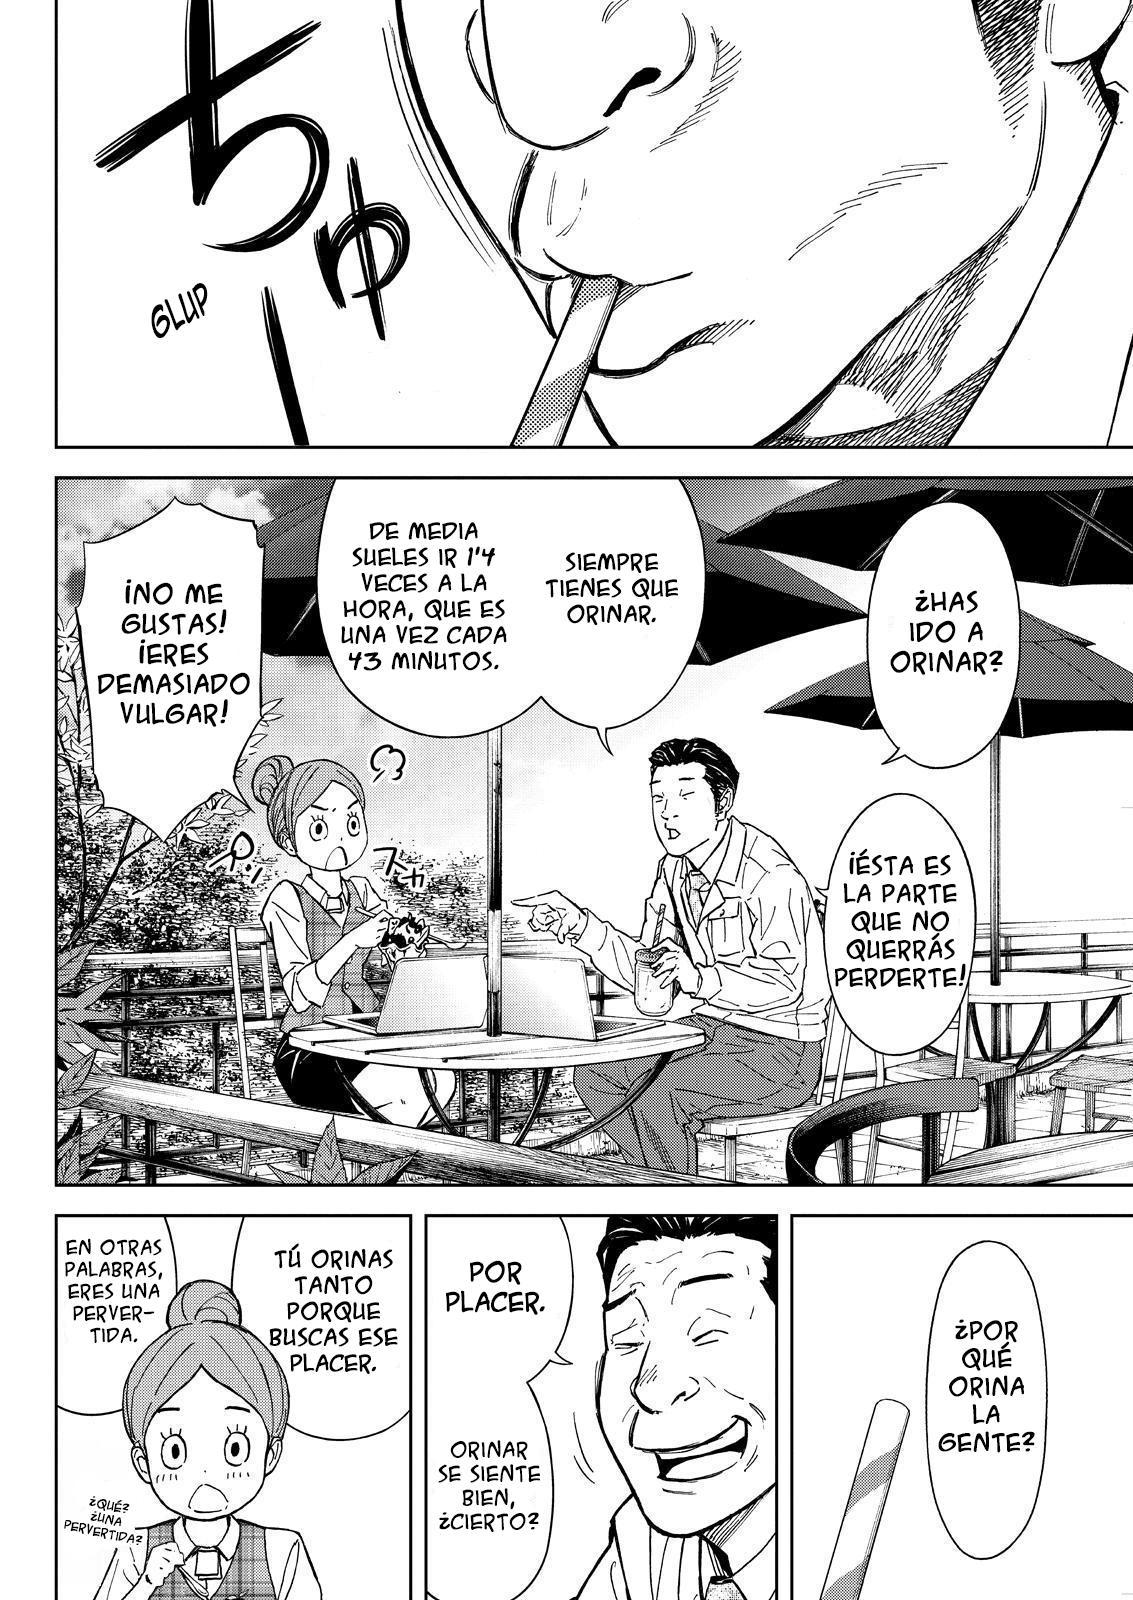 http://c5.ninemanga.com/es_manga/54/16310/437021/1256a280abab9e91c84614516a4d6068.jpg Page 3